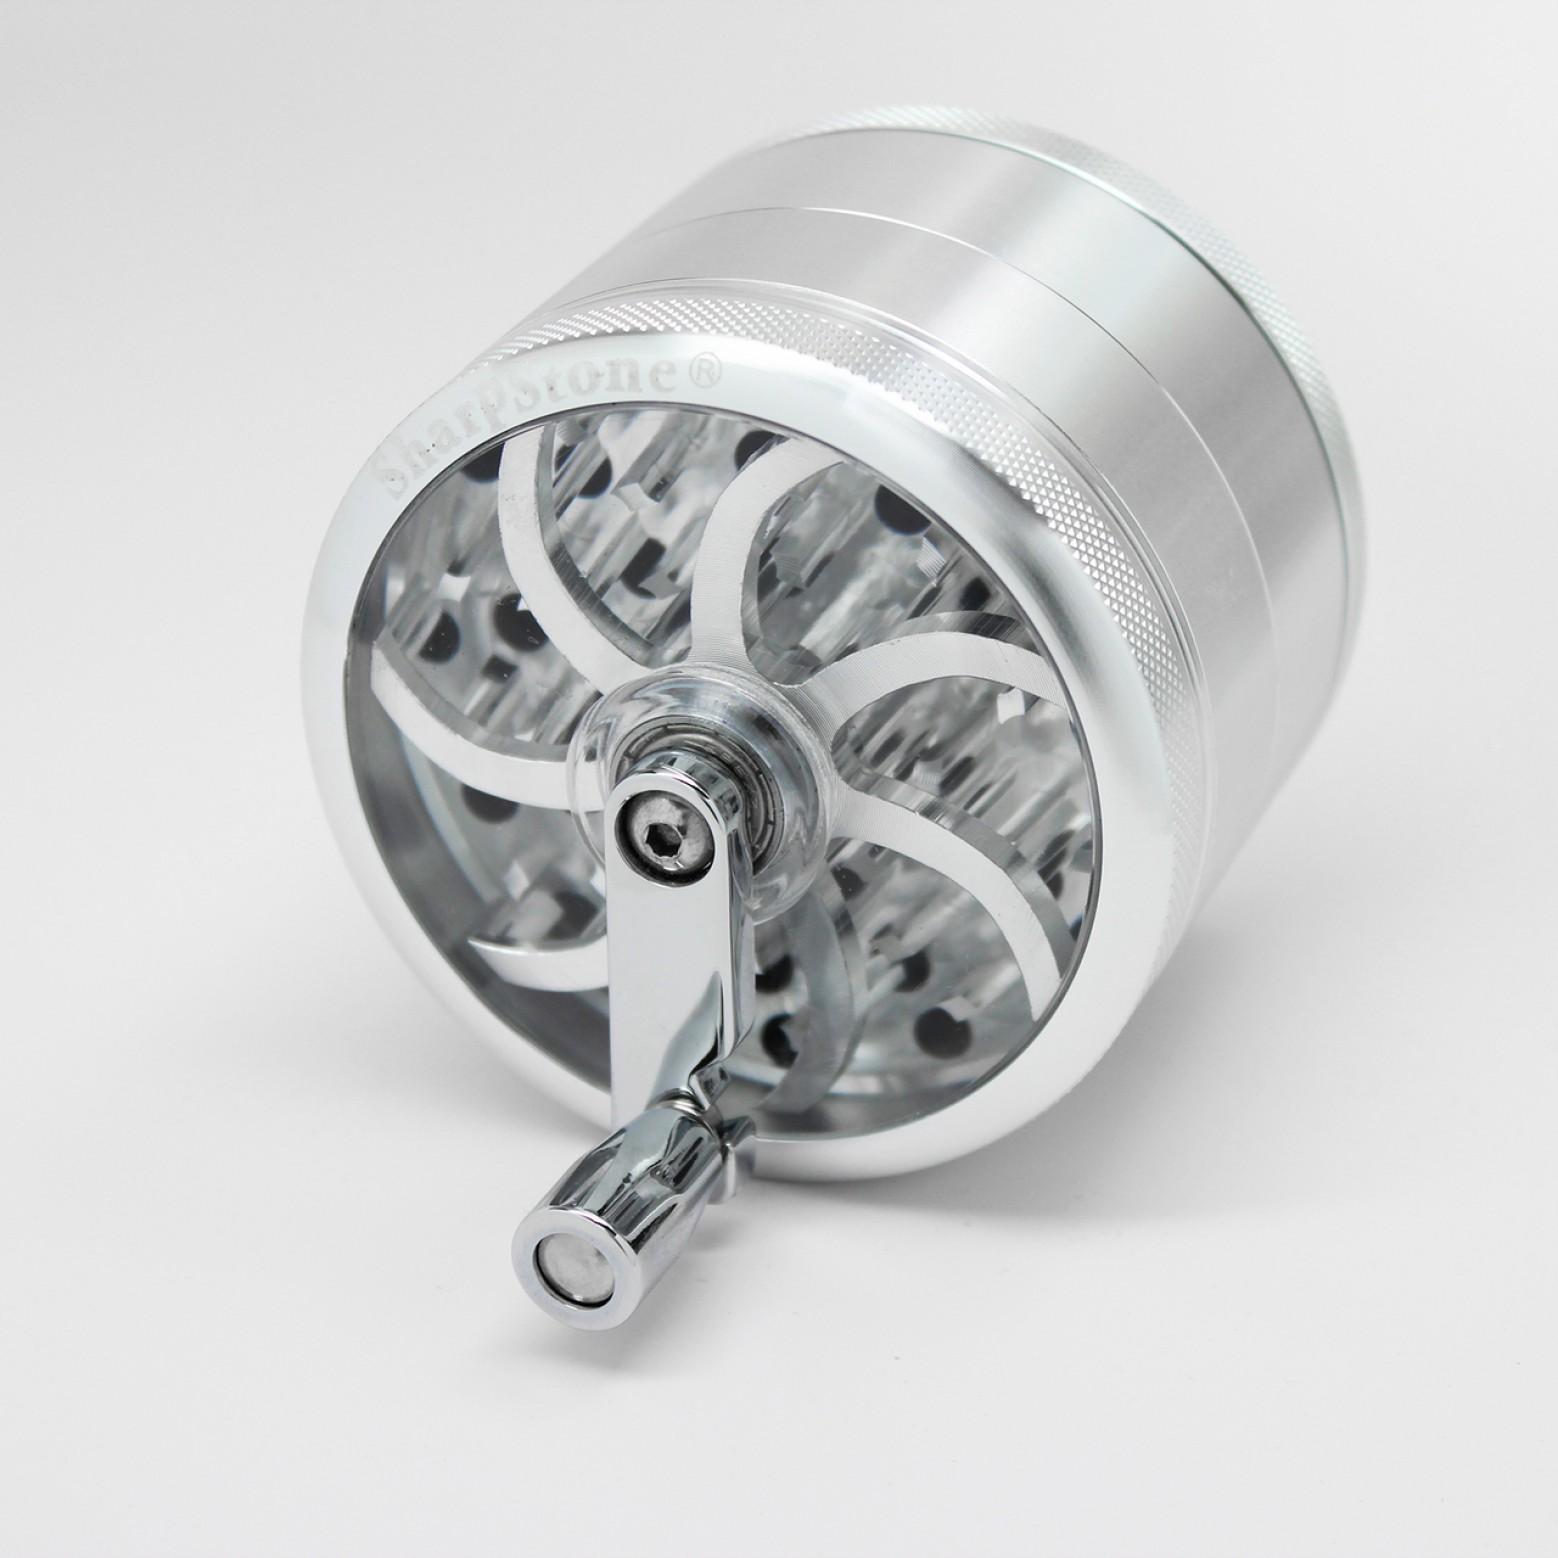 Młynek Sharpstone Turbowheel Grinder Srebrny (Ø64mm 4 części)